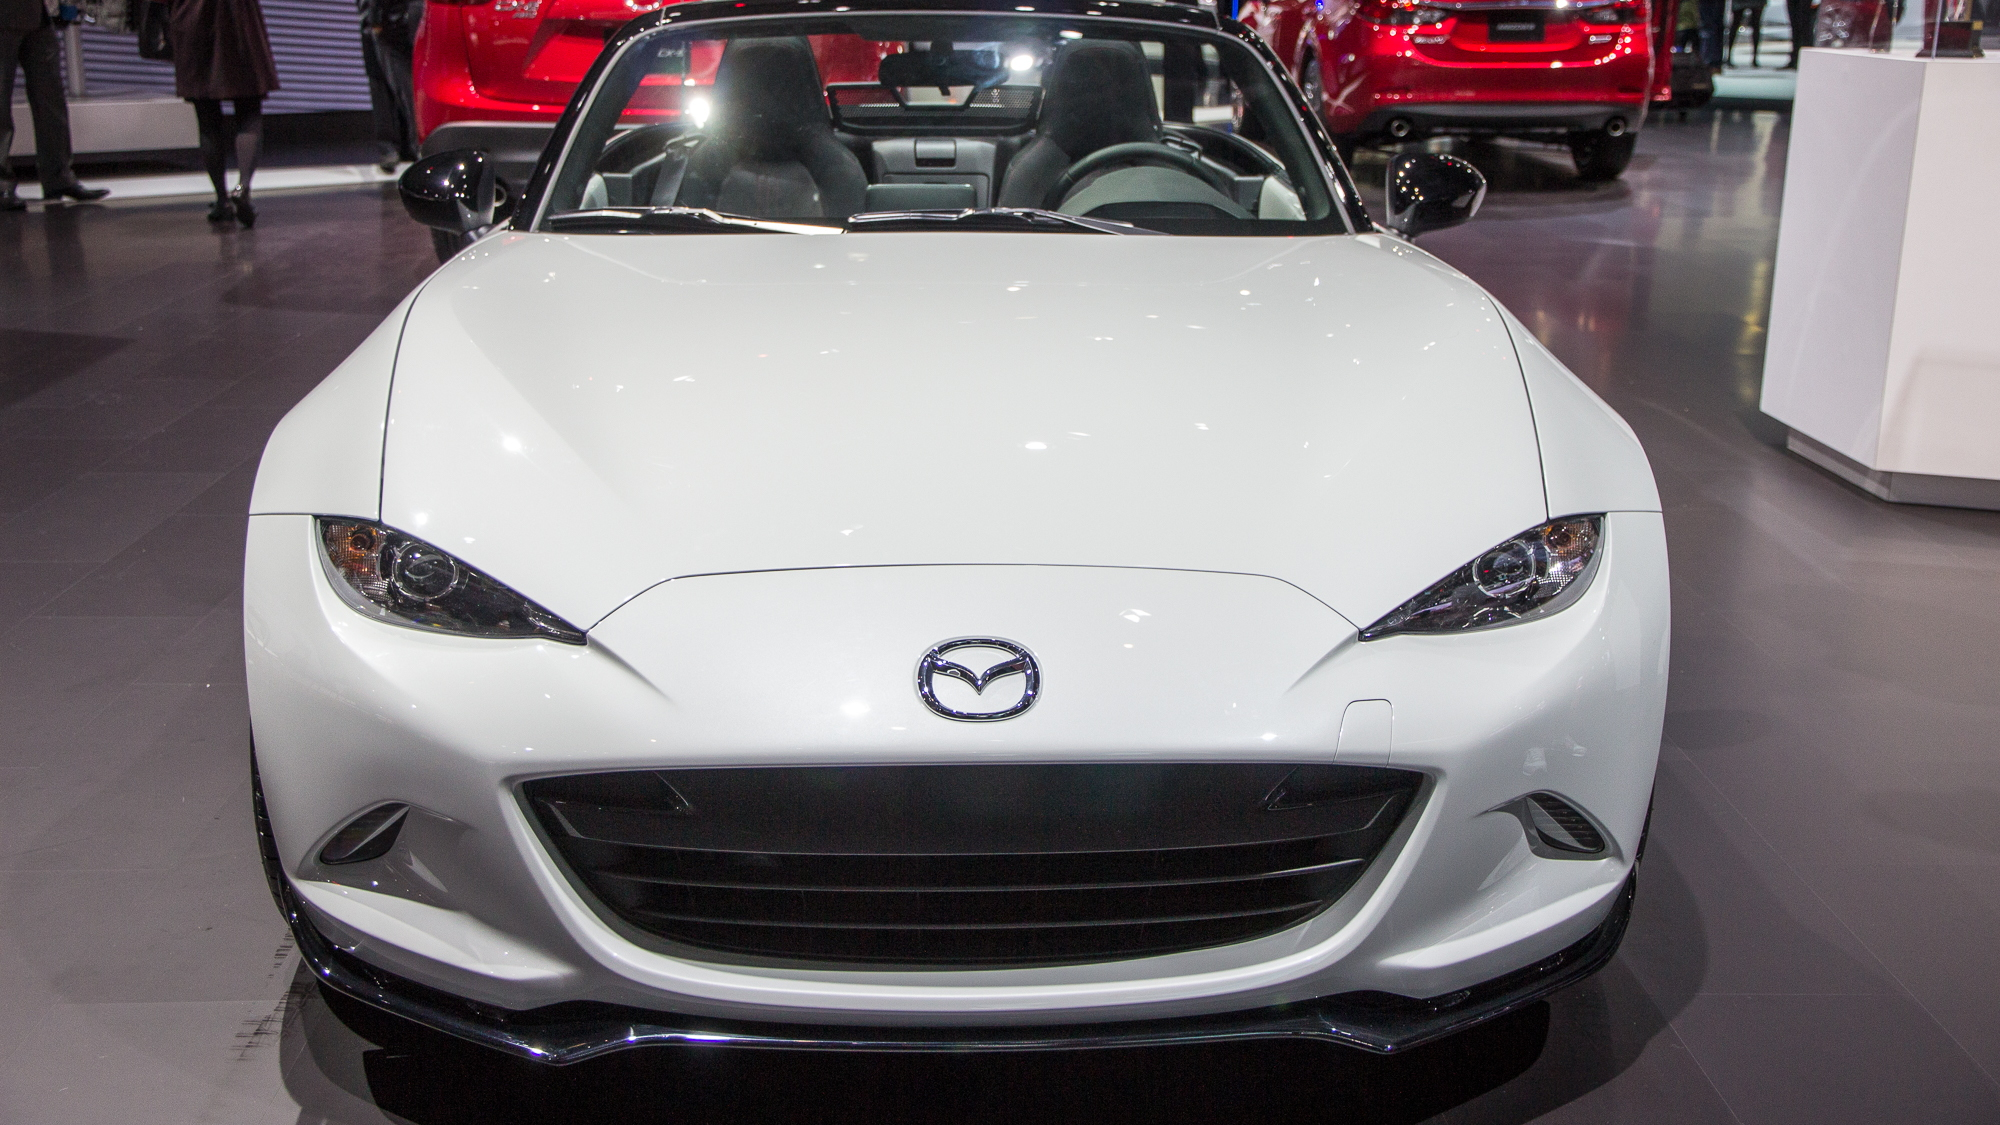 2016 Mazda MX-5 Club, 2015 New York Auto Show